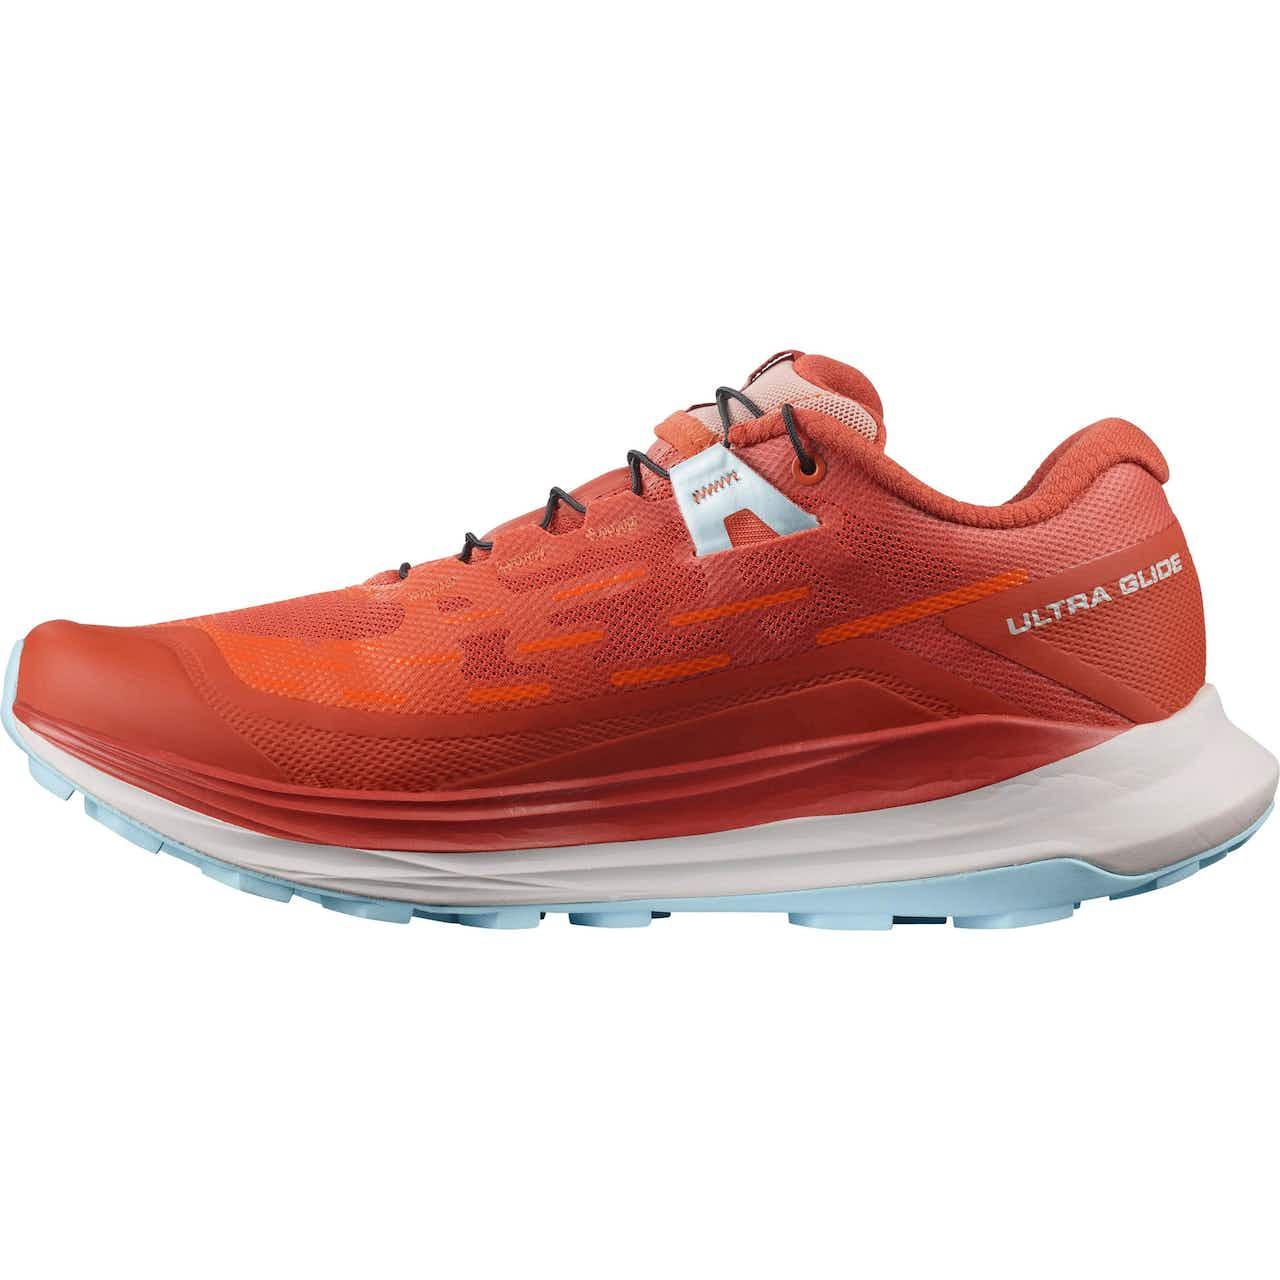 Salomon ULTRA GLIDE W Trailrunning Schuhe Damen